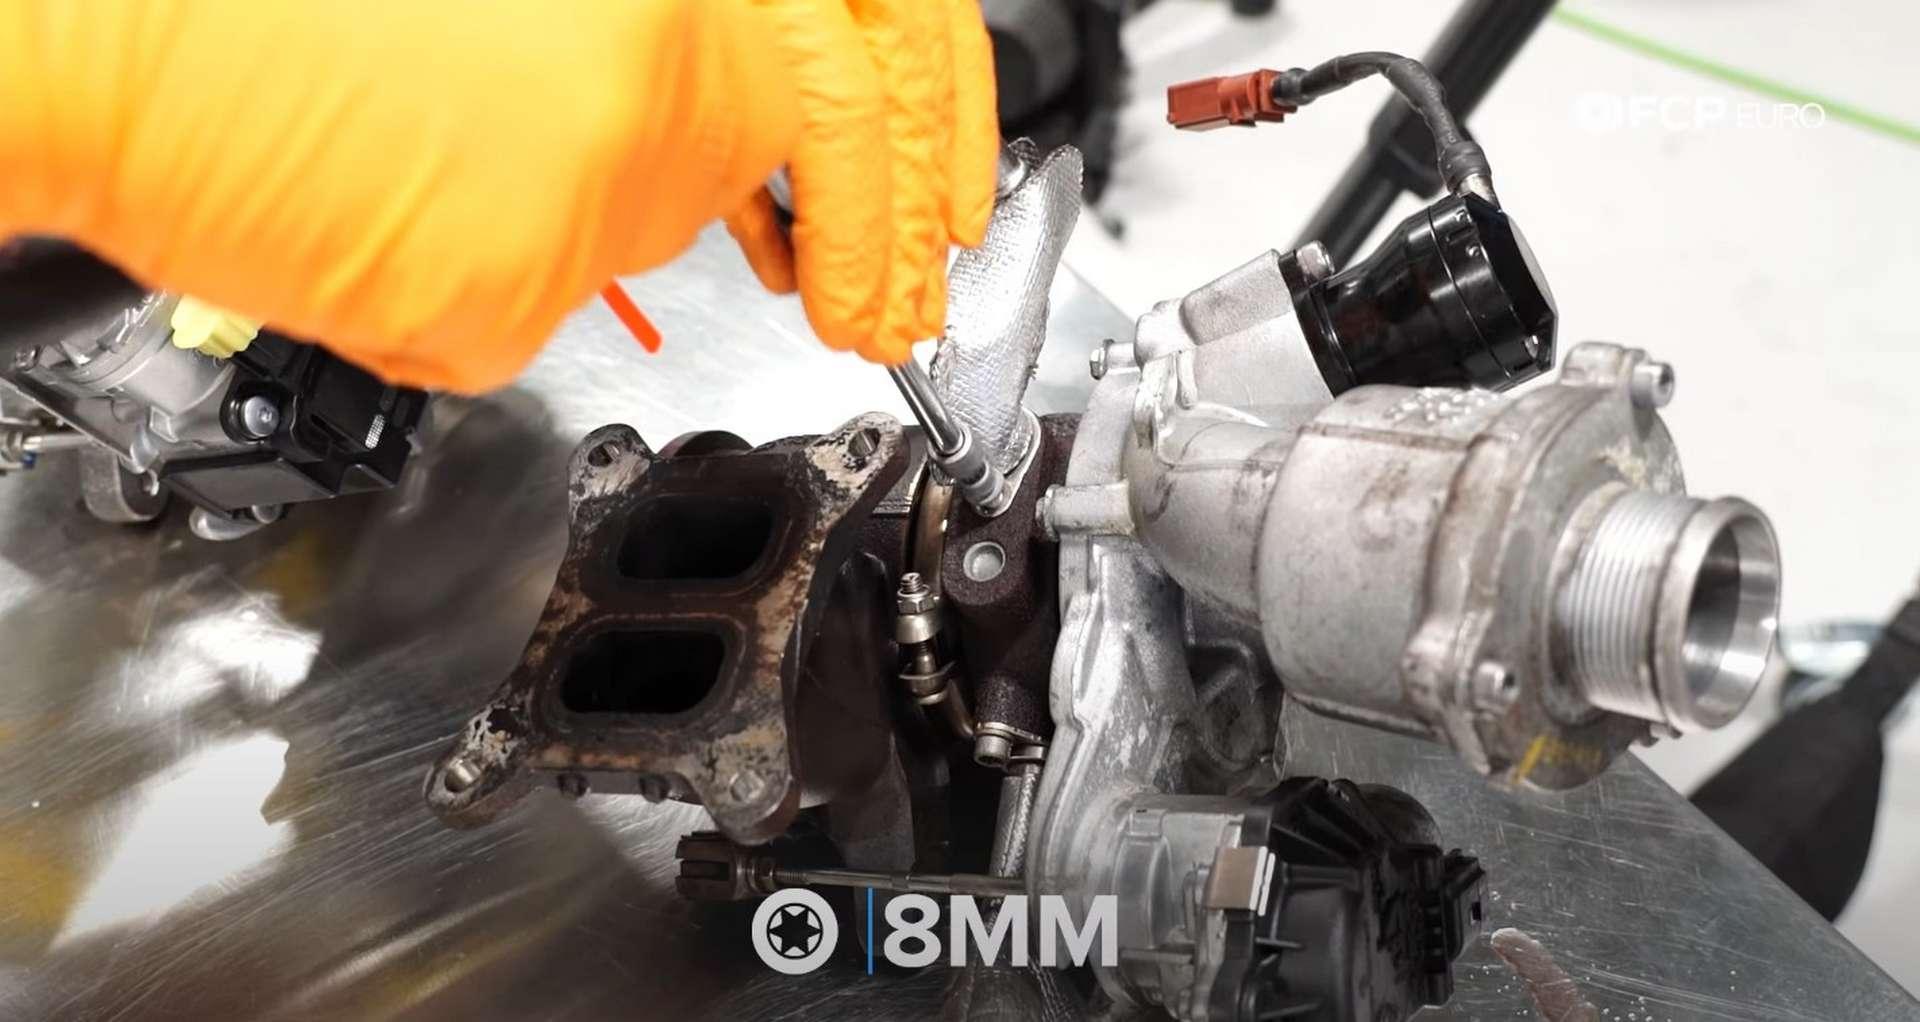 DIY MK7 VW GTI Turbocharger Upgrade removing the coolant return line fitting